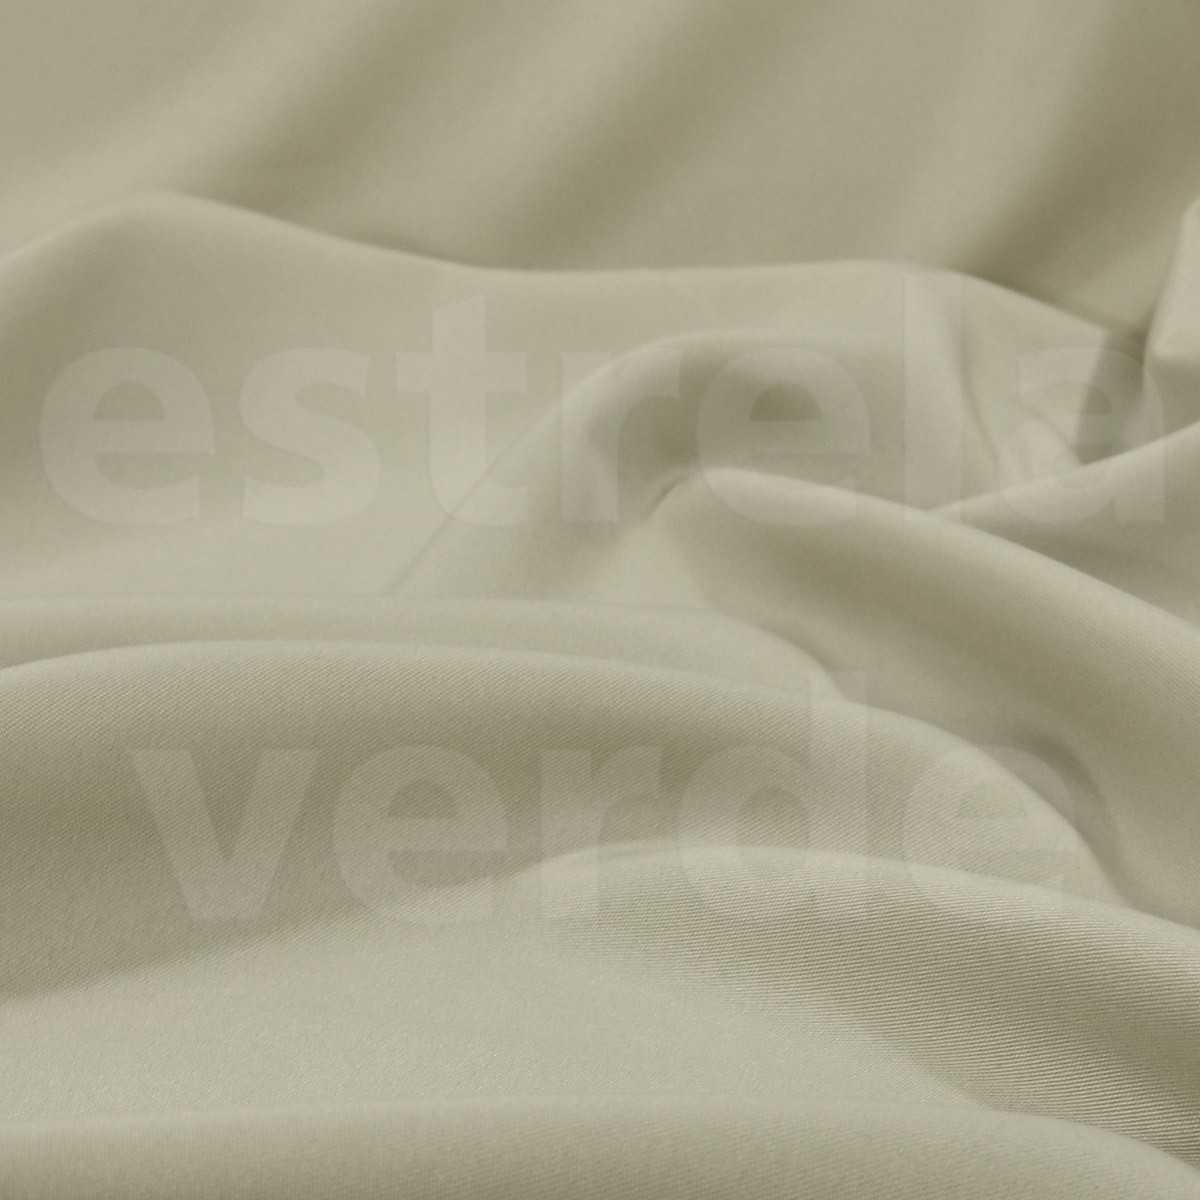 Oxford Kraft/Bege Claro 220gr 1,50 Larg  - Estrela Verde